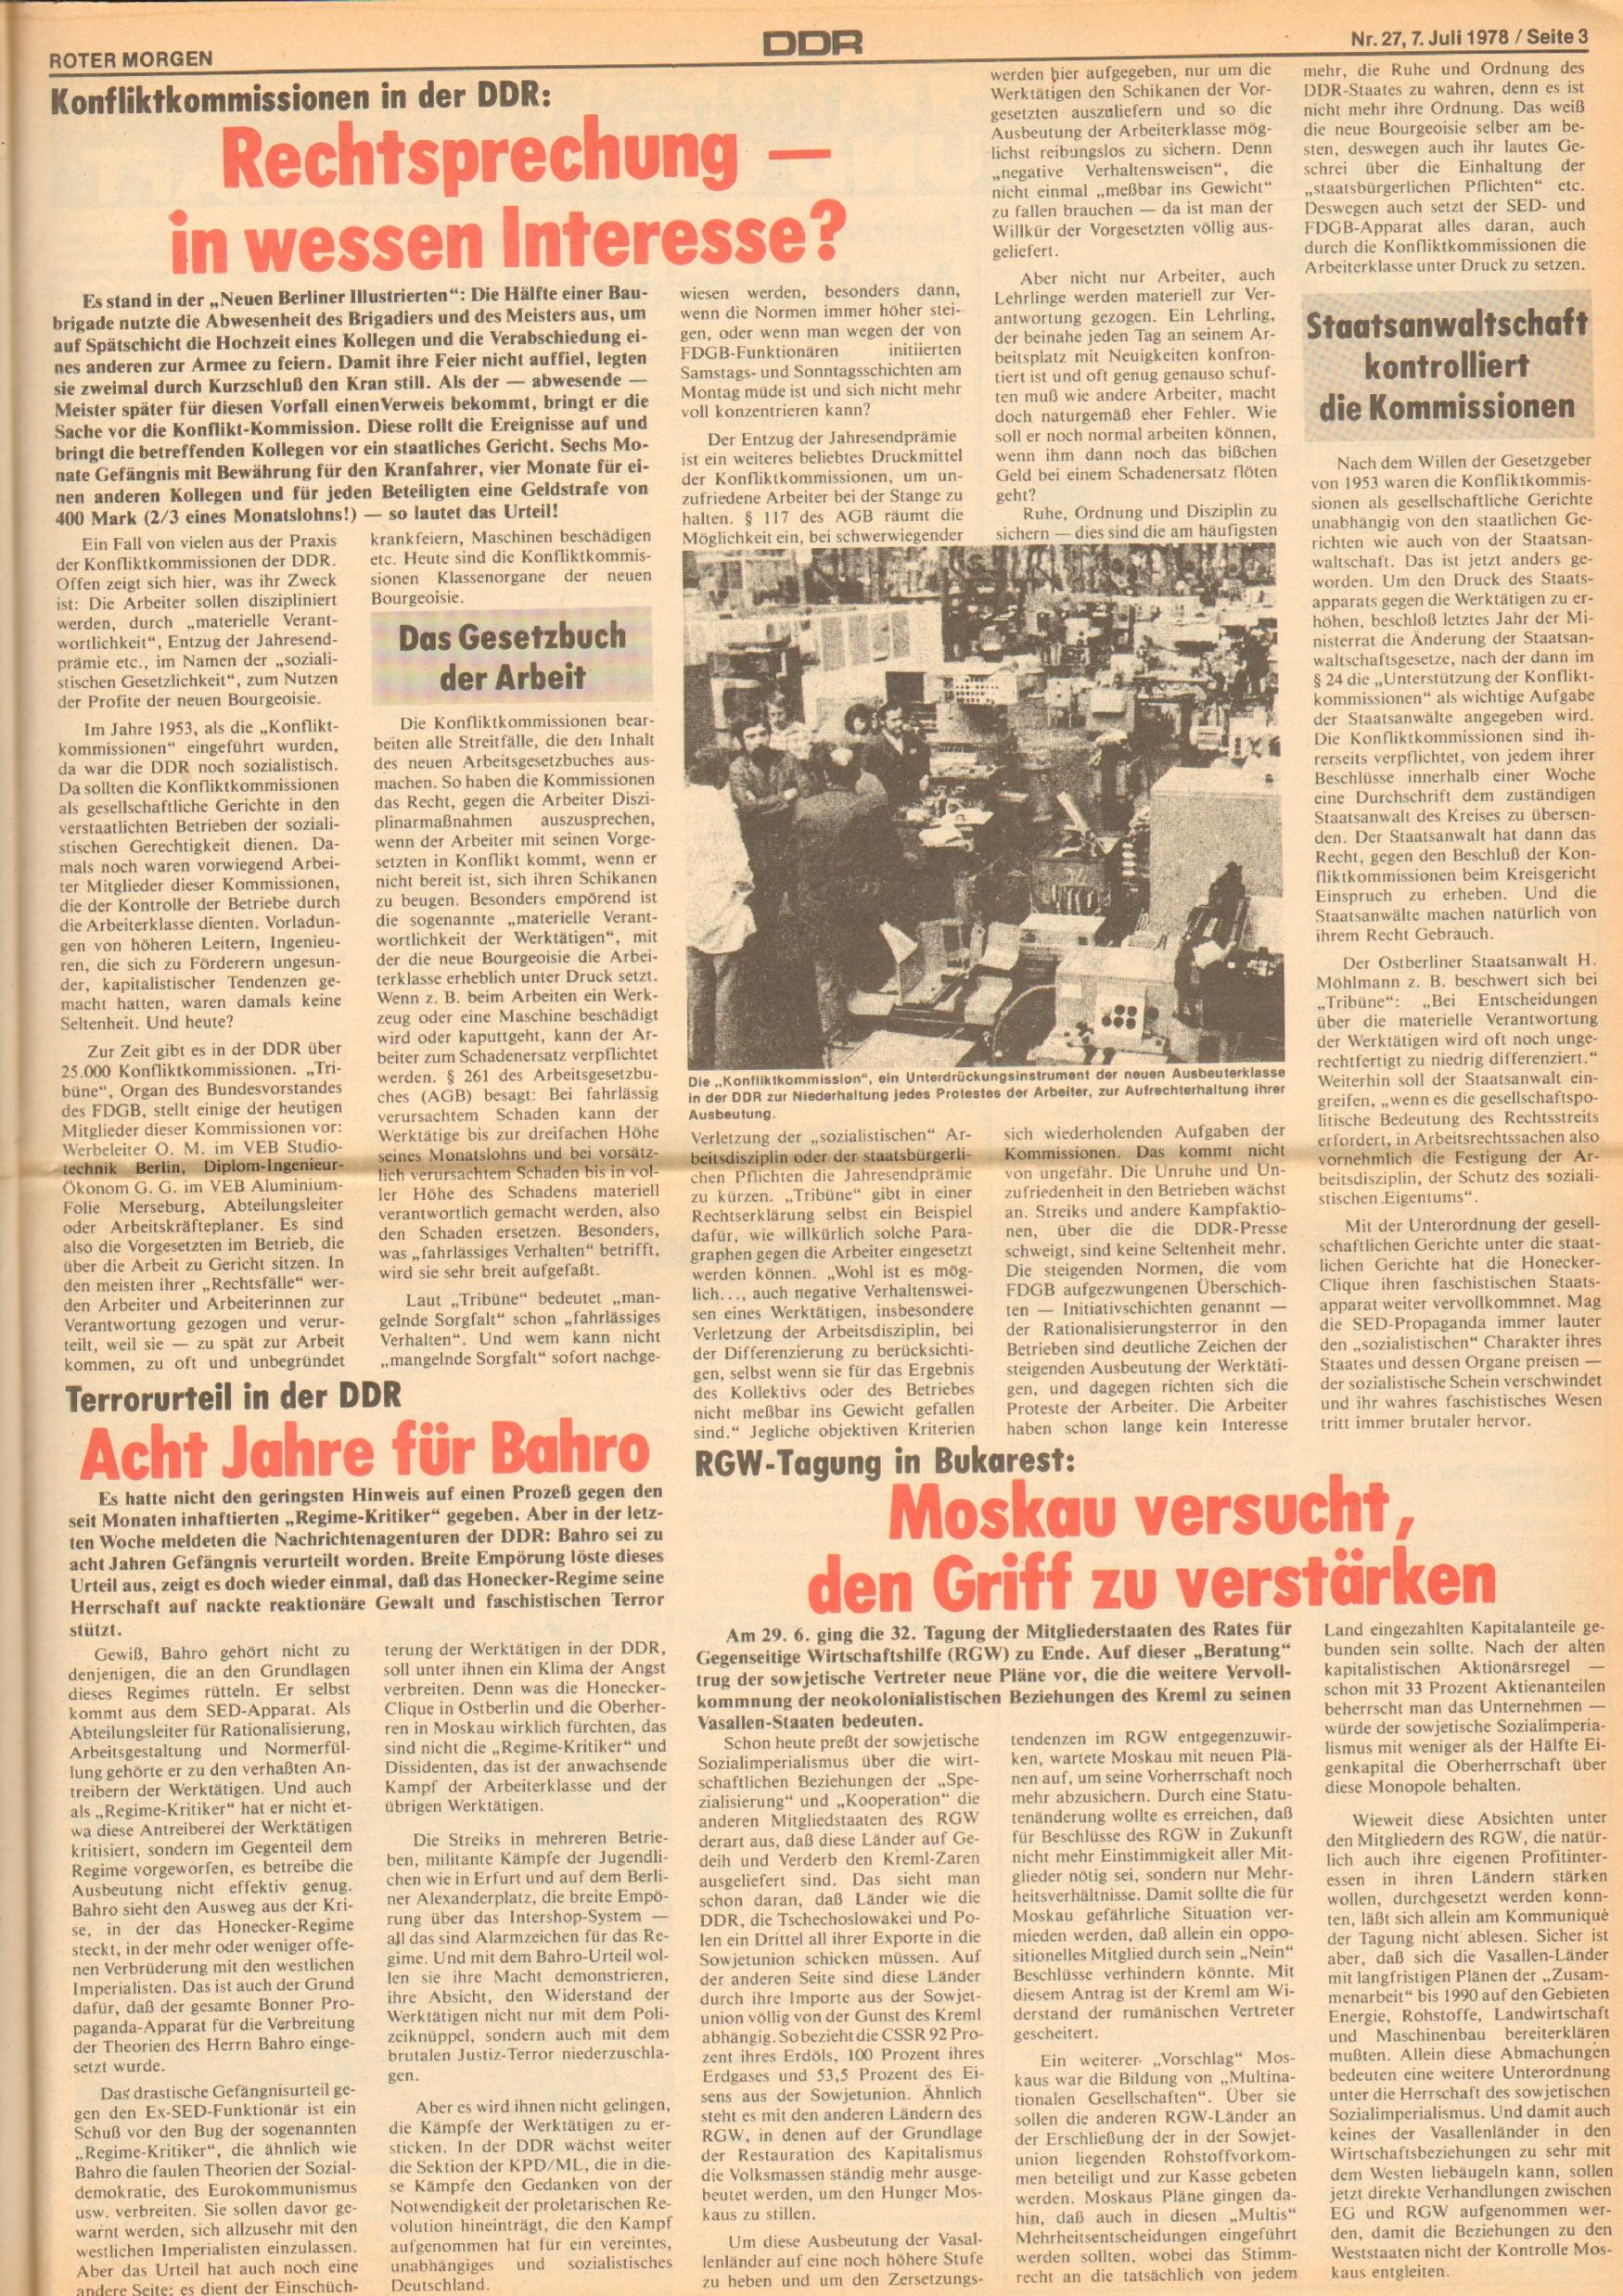 Roter Morgen, 12. Jg., 7. Juli 1978, Nr. 27, Seite 3